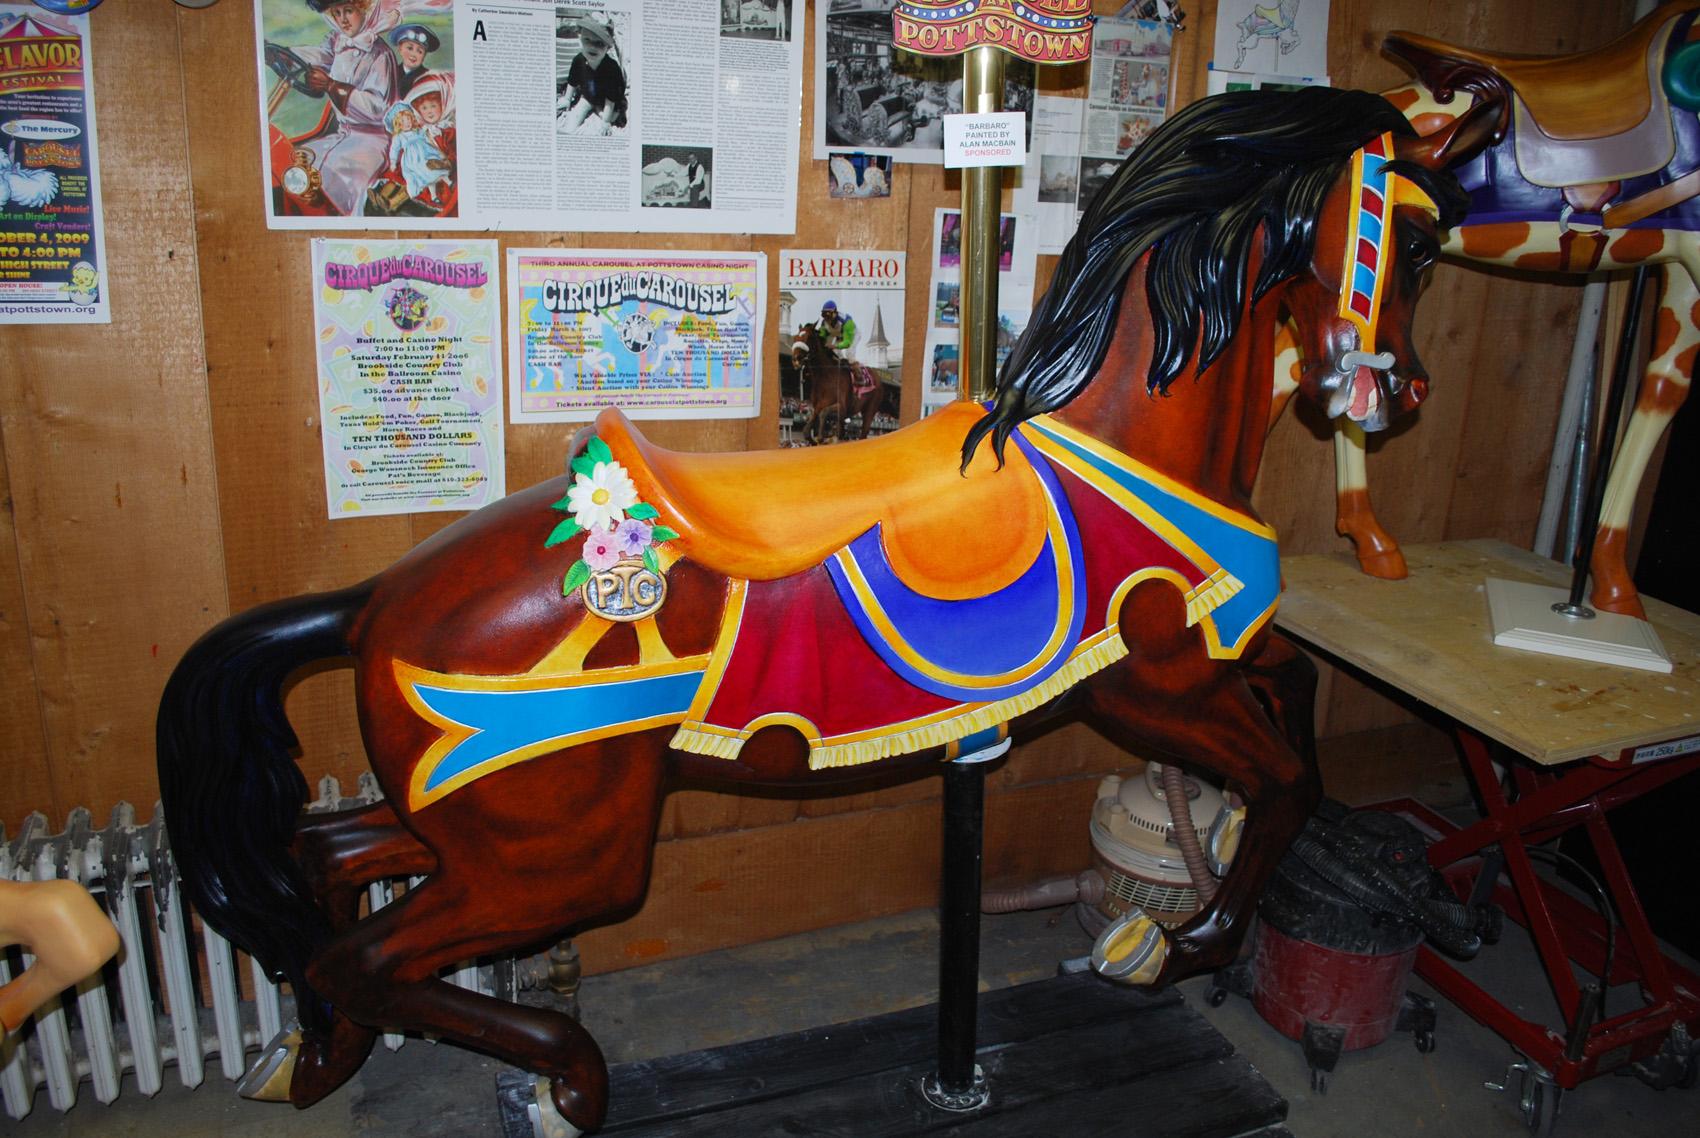 Pottstown-PA-carousel-horse-osr-jumper-ca-2010-Ed-Roth